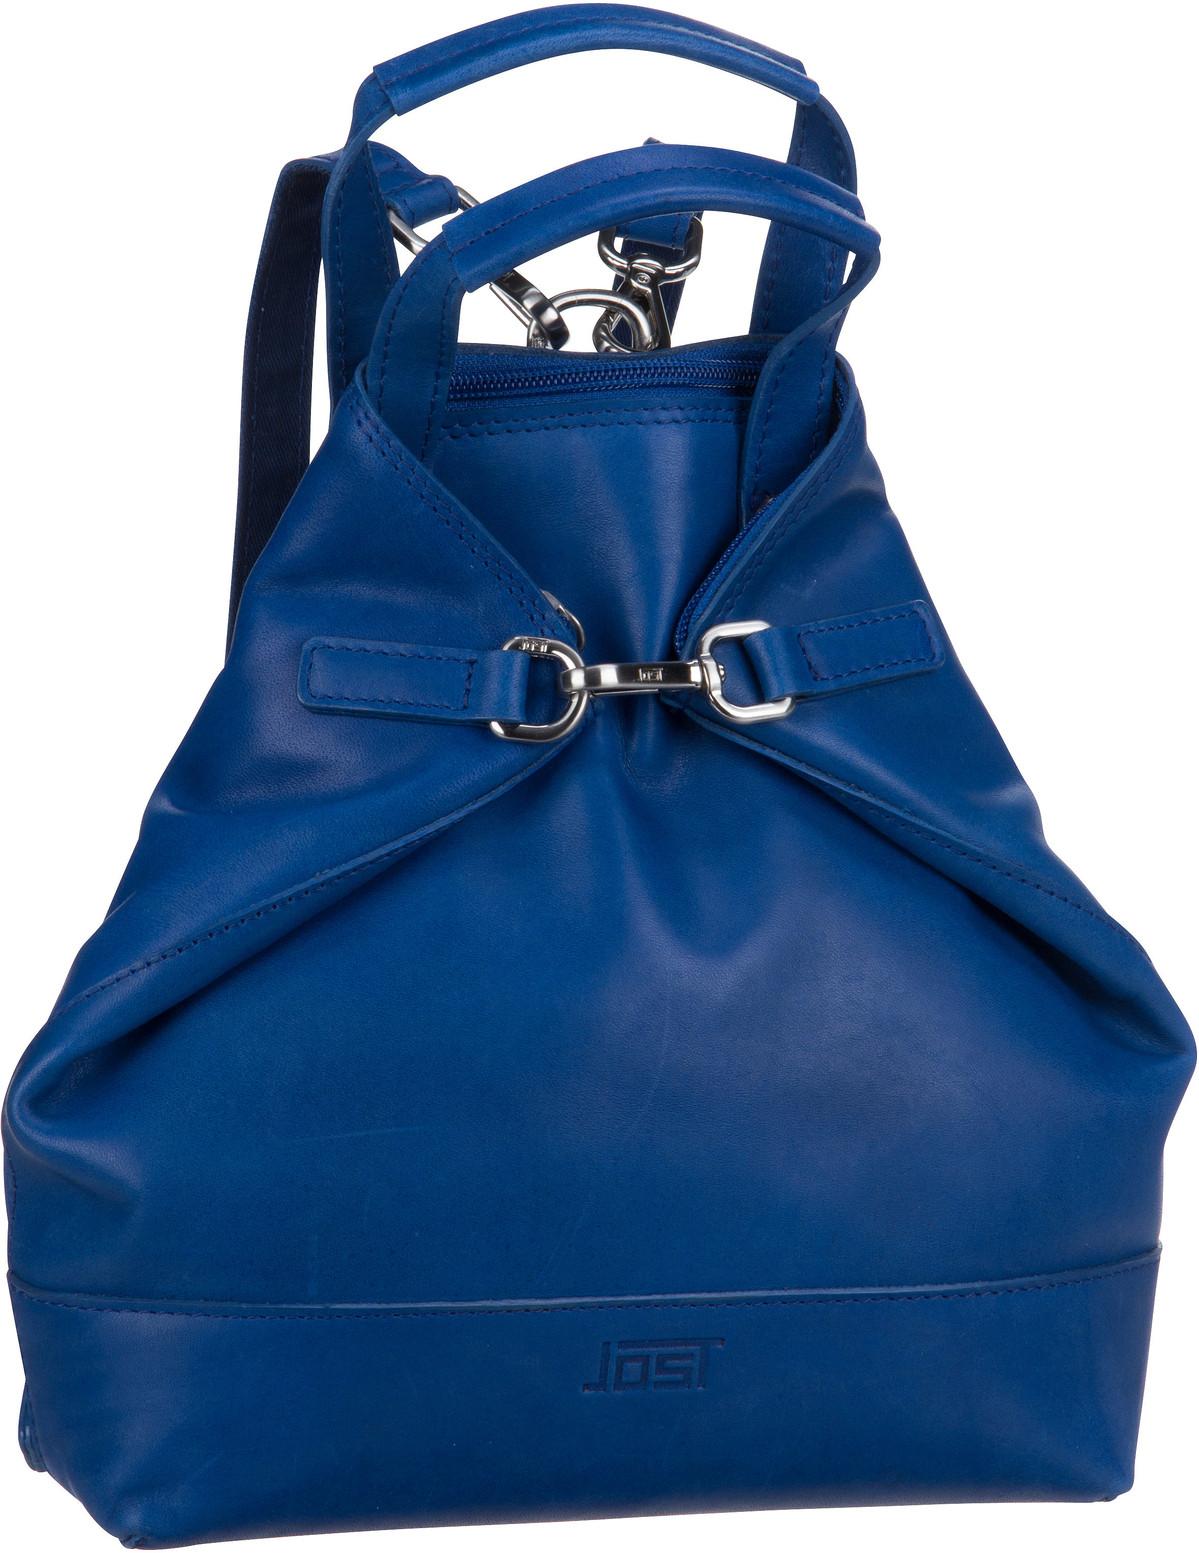 Rucksack / Daypack Rana 1276 X-Change Bag Mini Royalblue